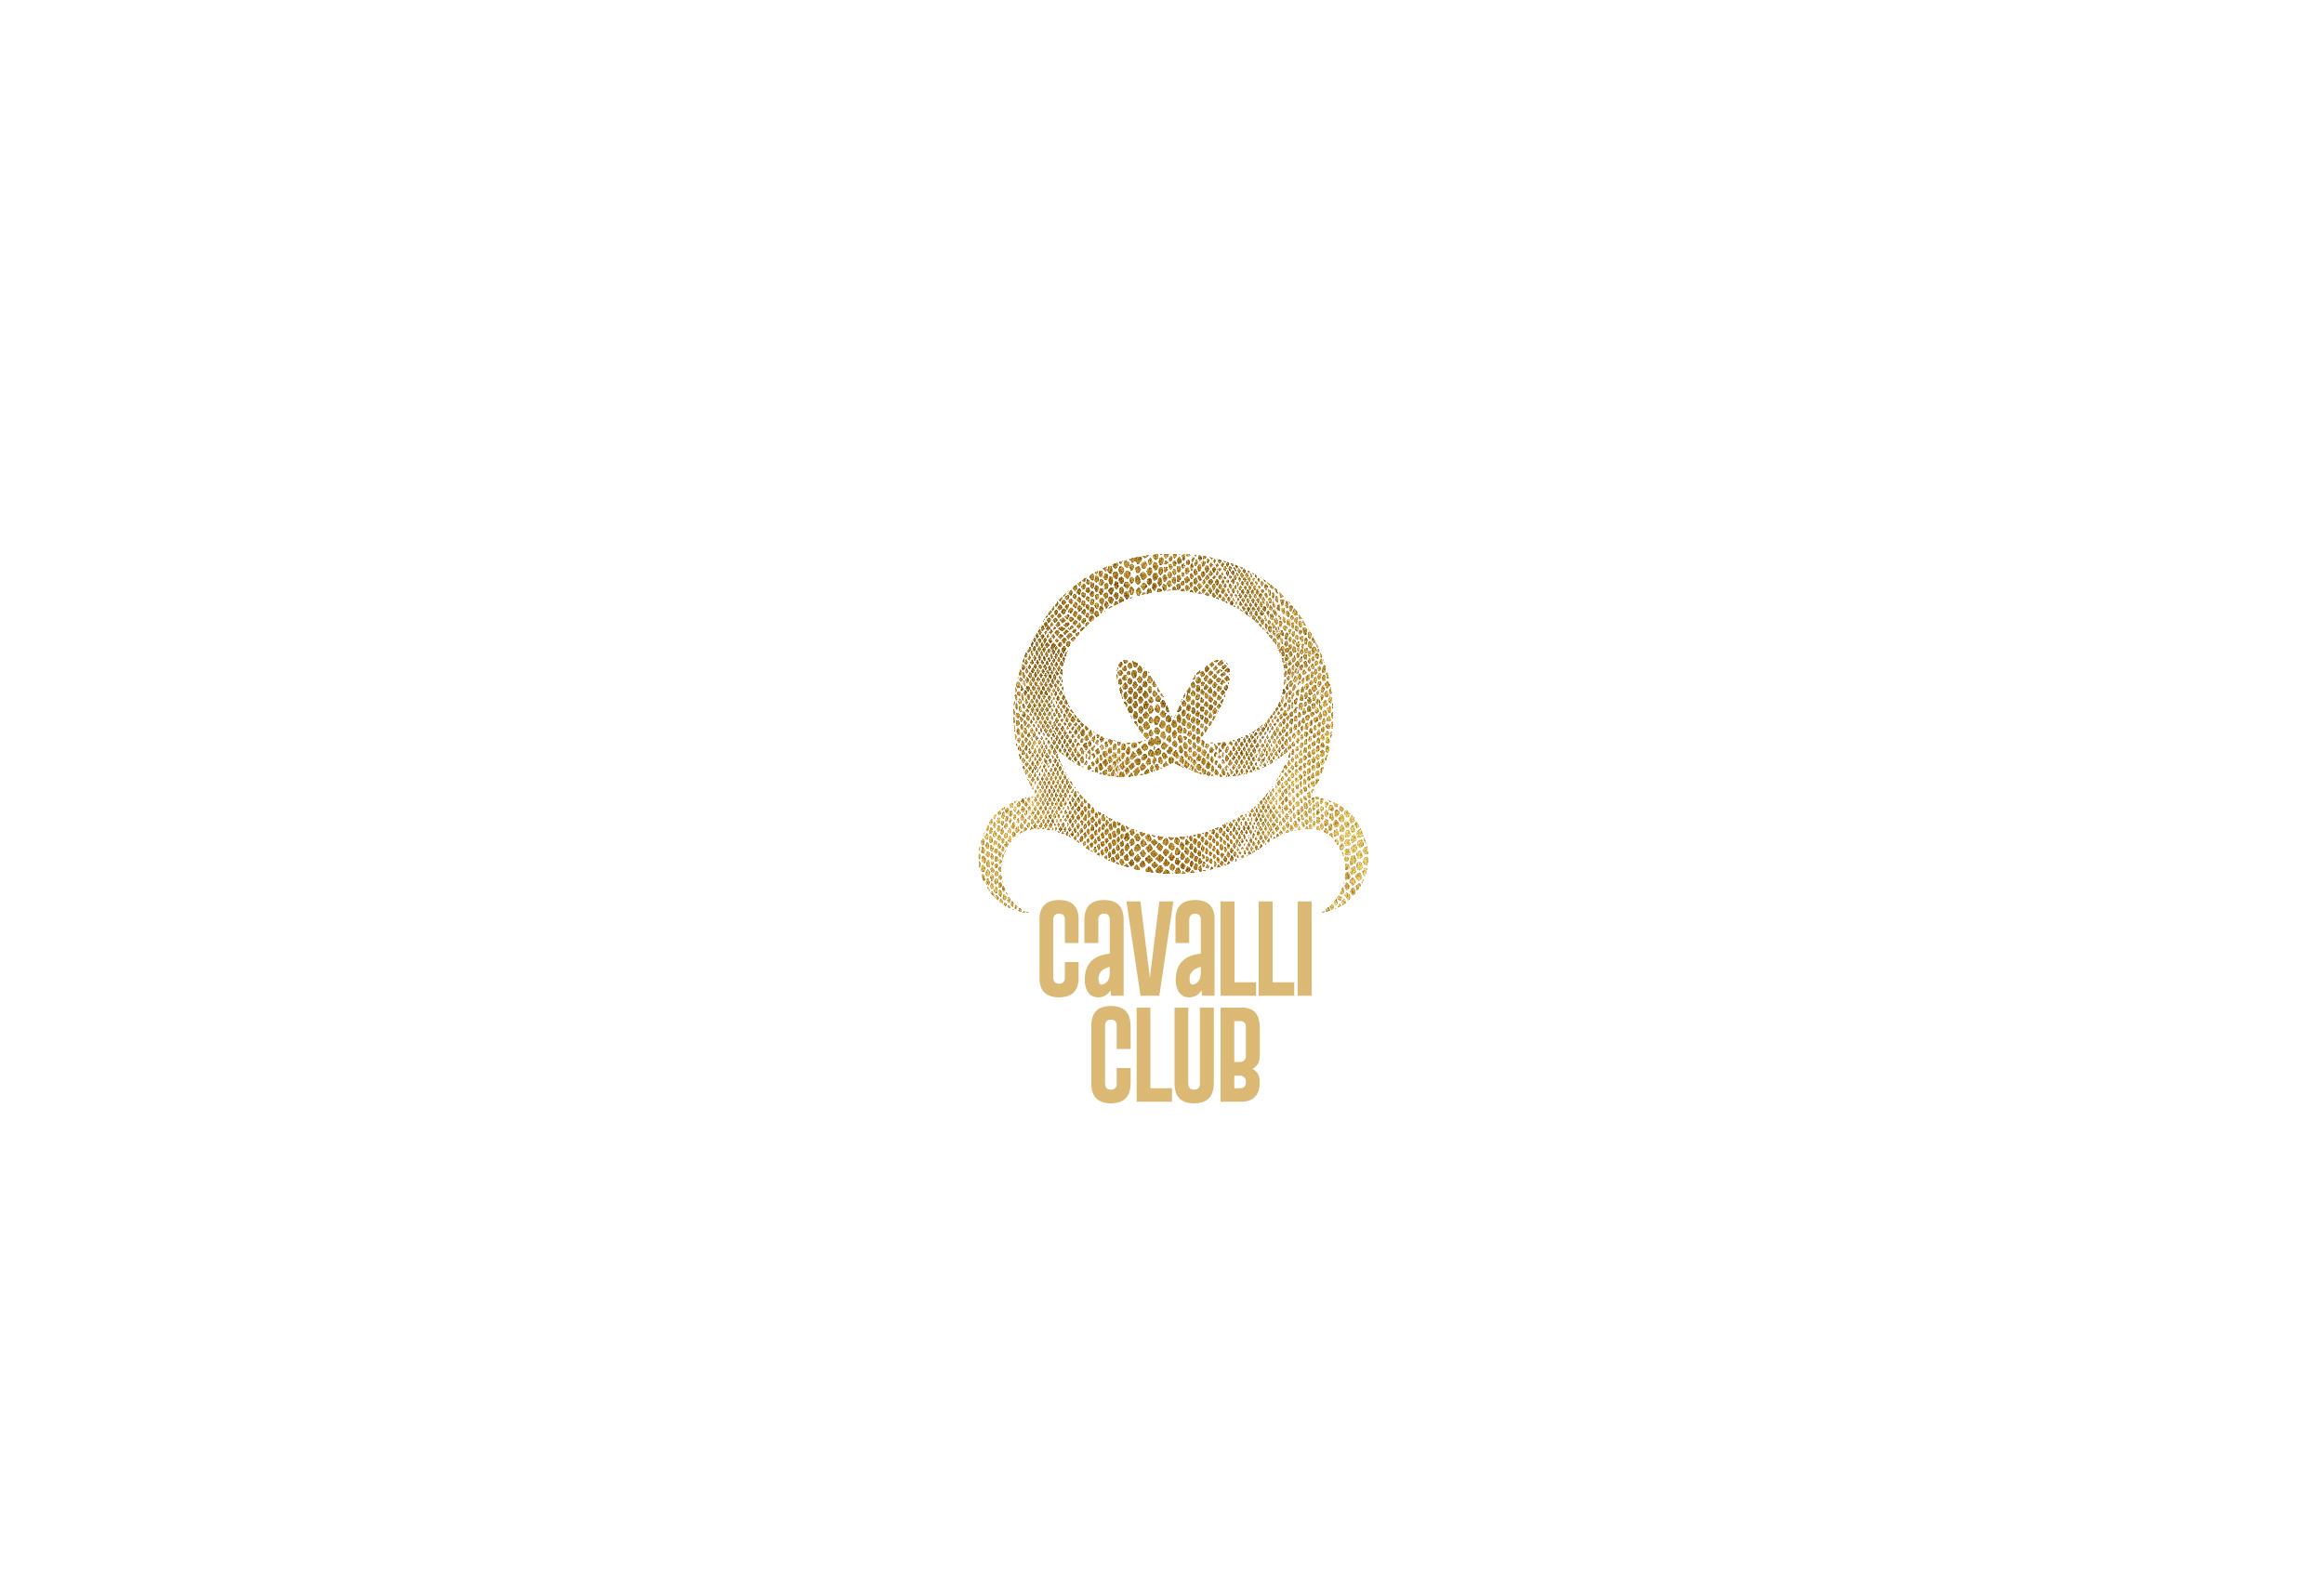 dezakaya-logo-design-cavali-club-dubai